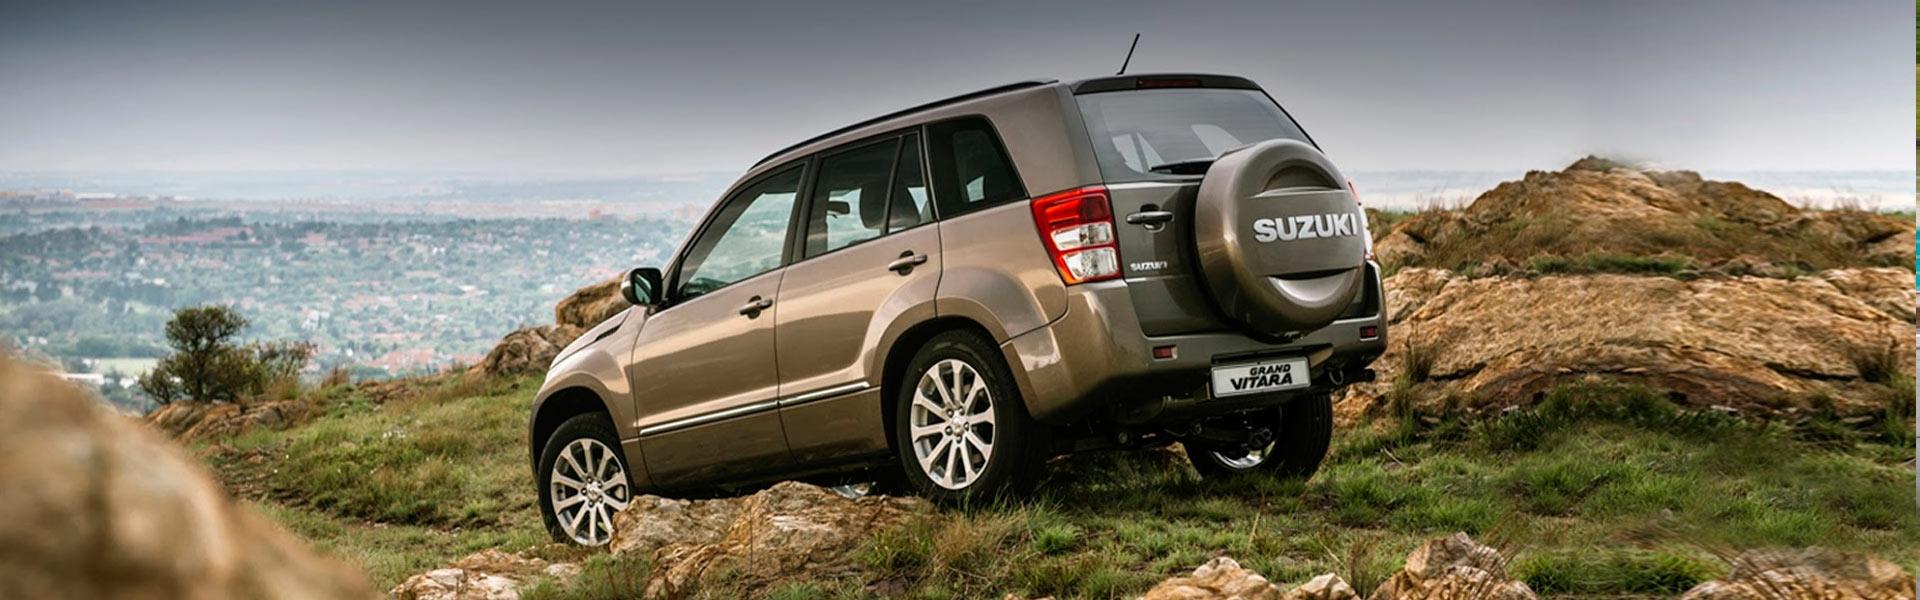 Сайлентблок на Suzuki Grand Vitara